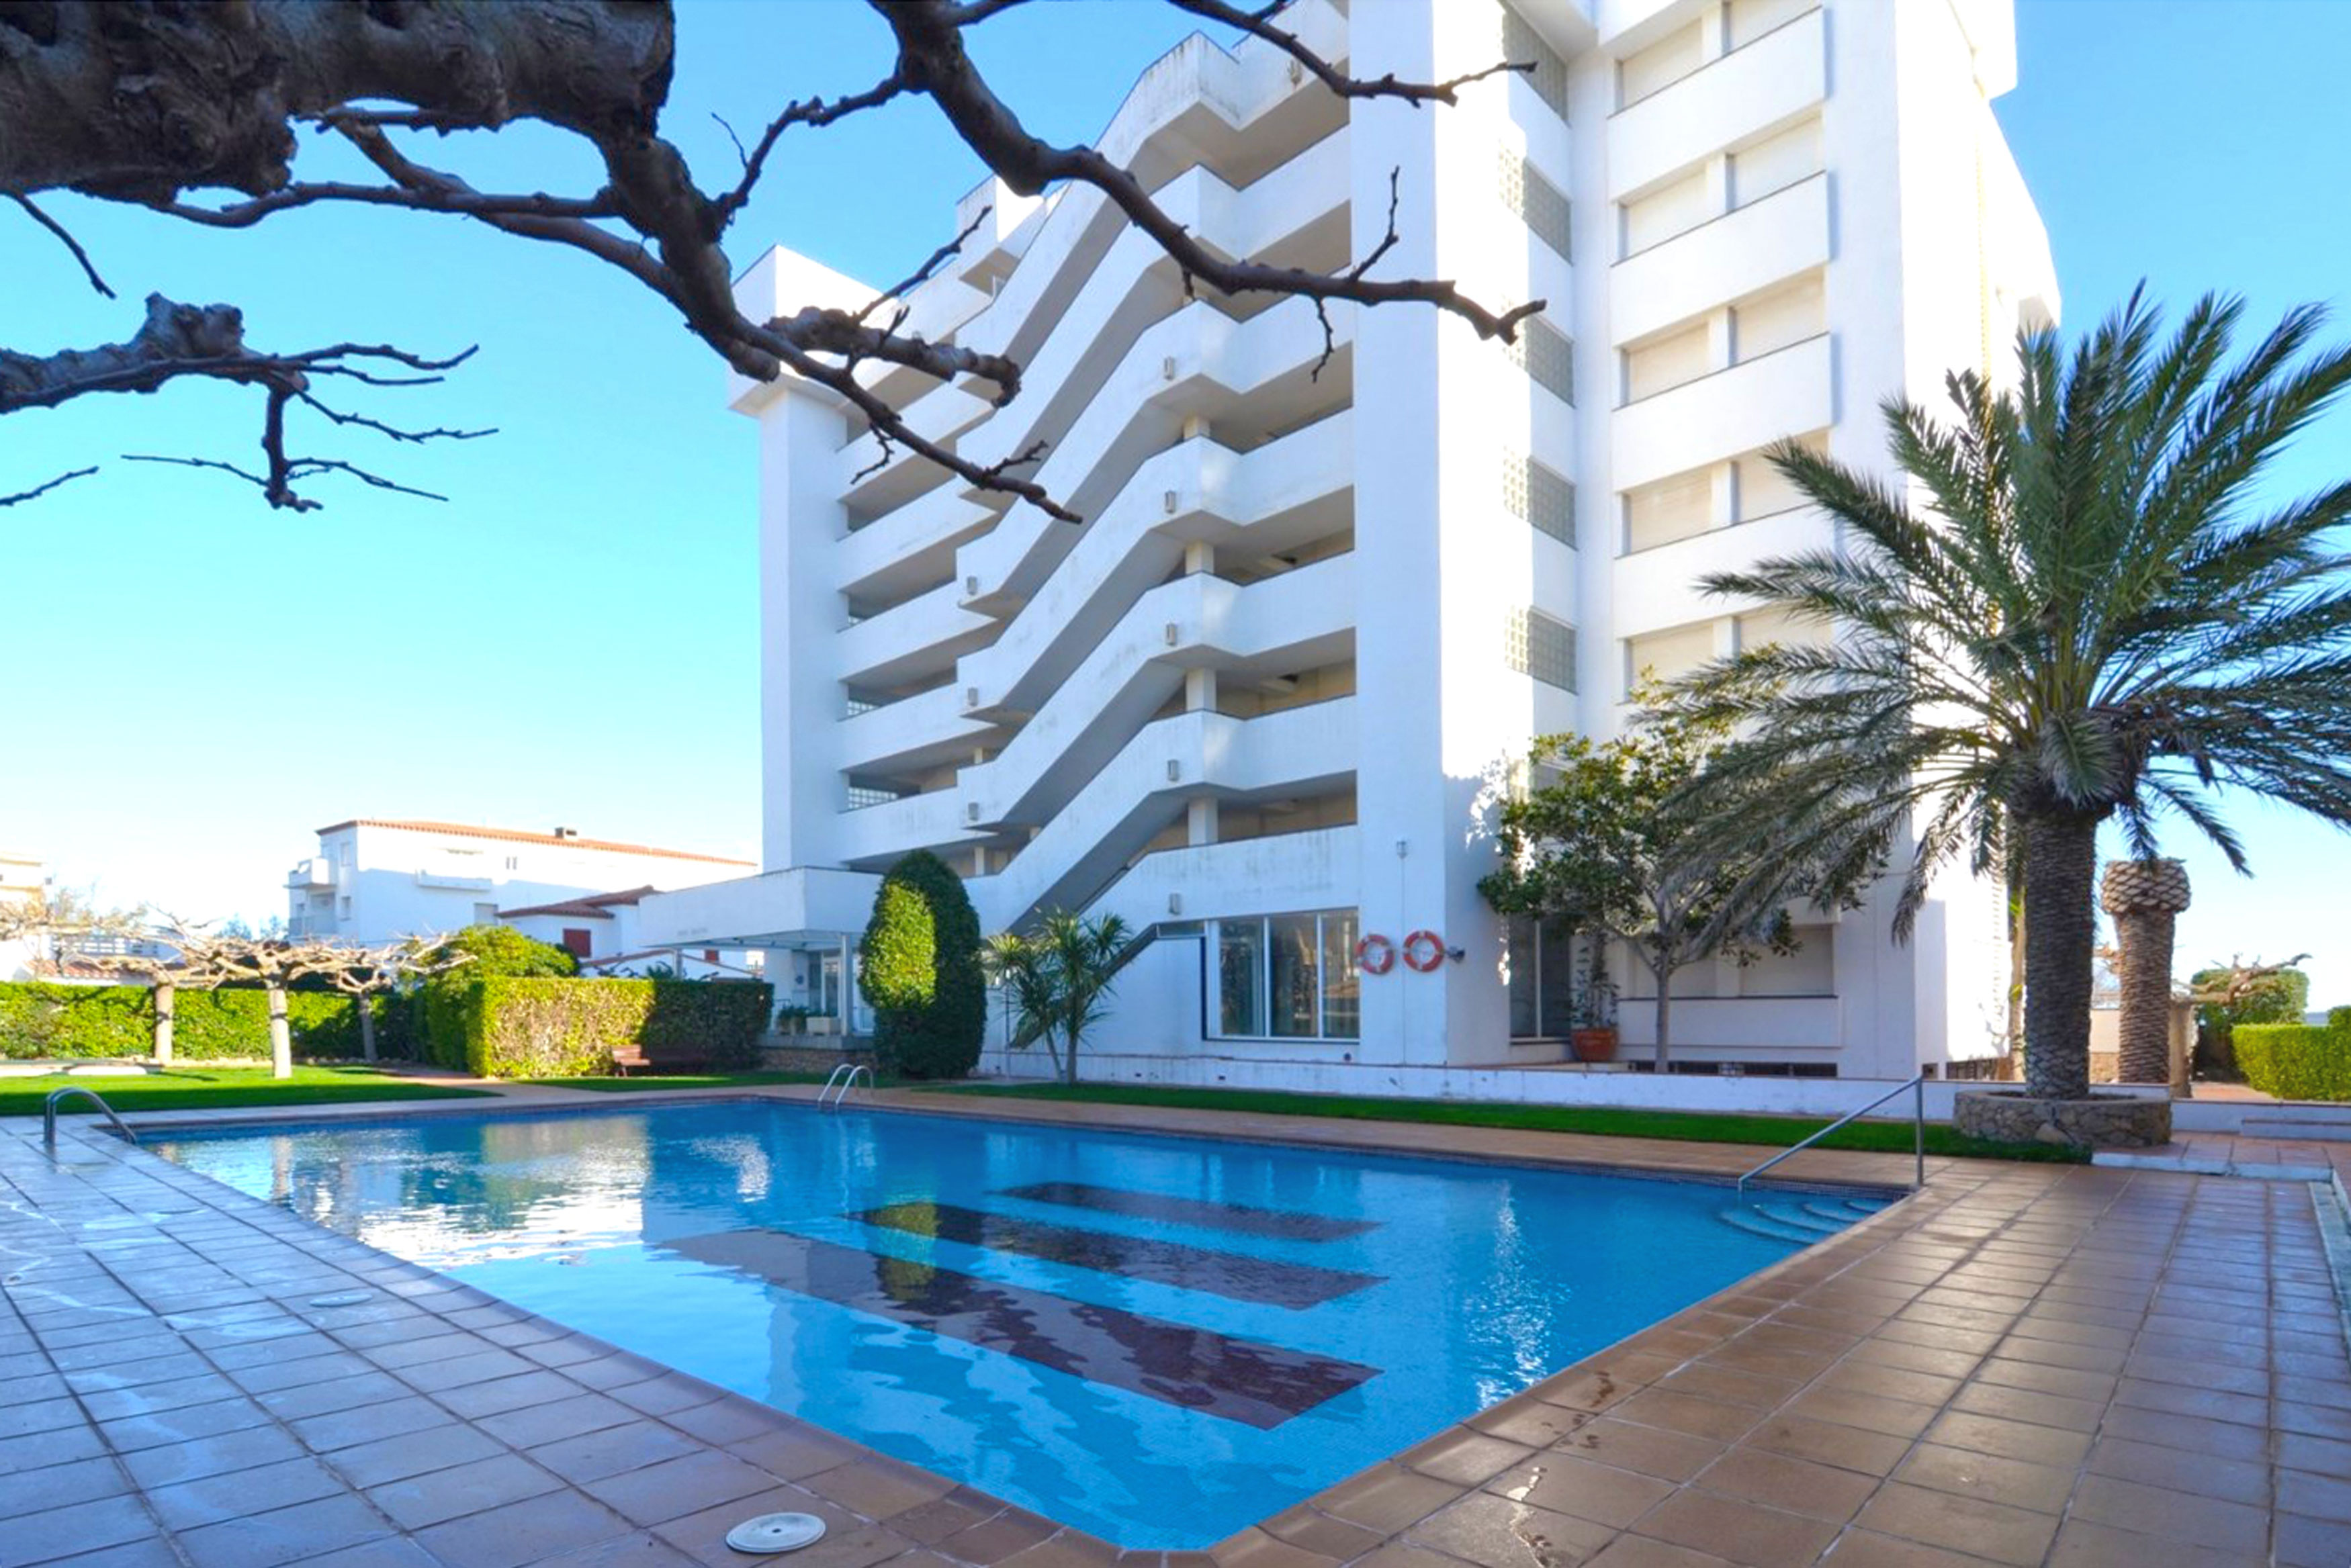 Vistamar l'Escala zwembad bij appartement